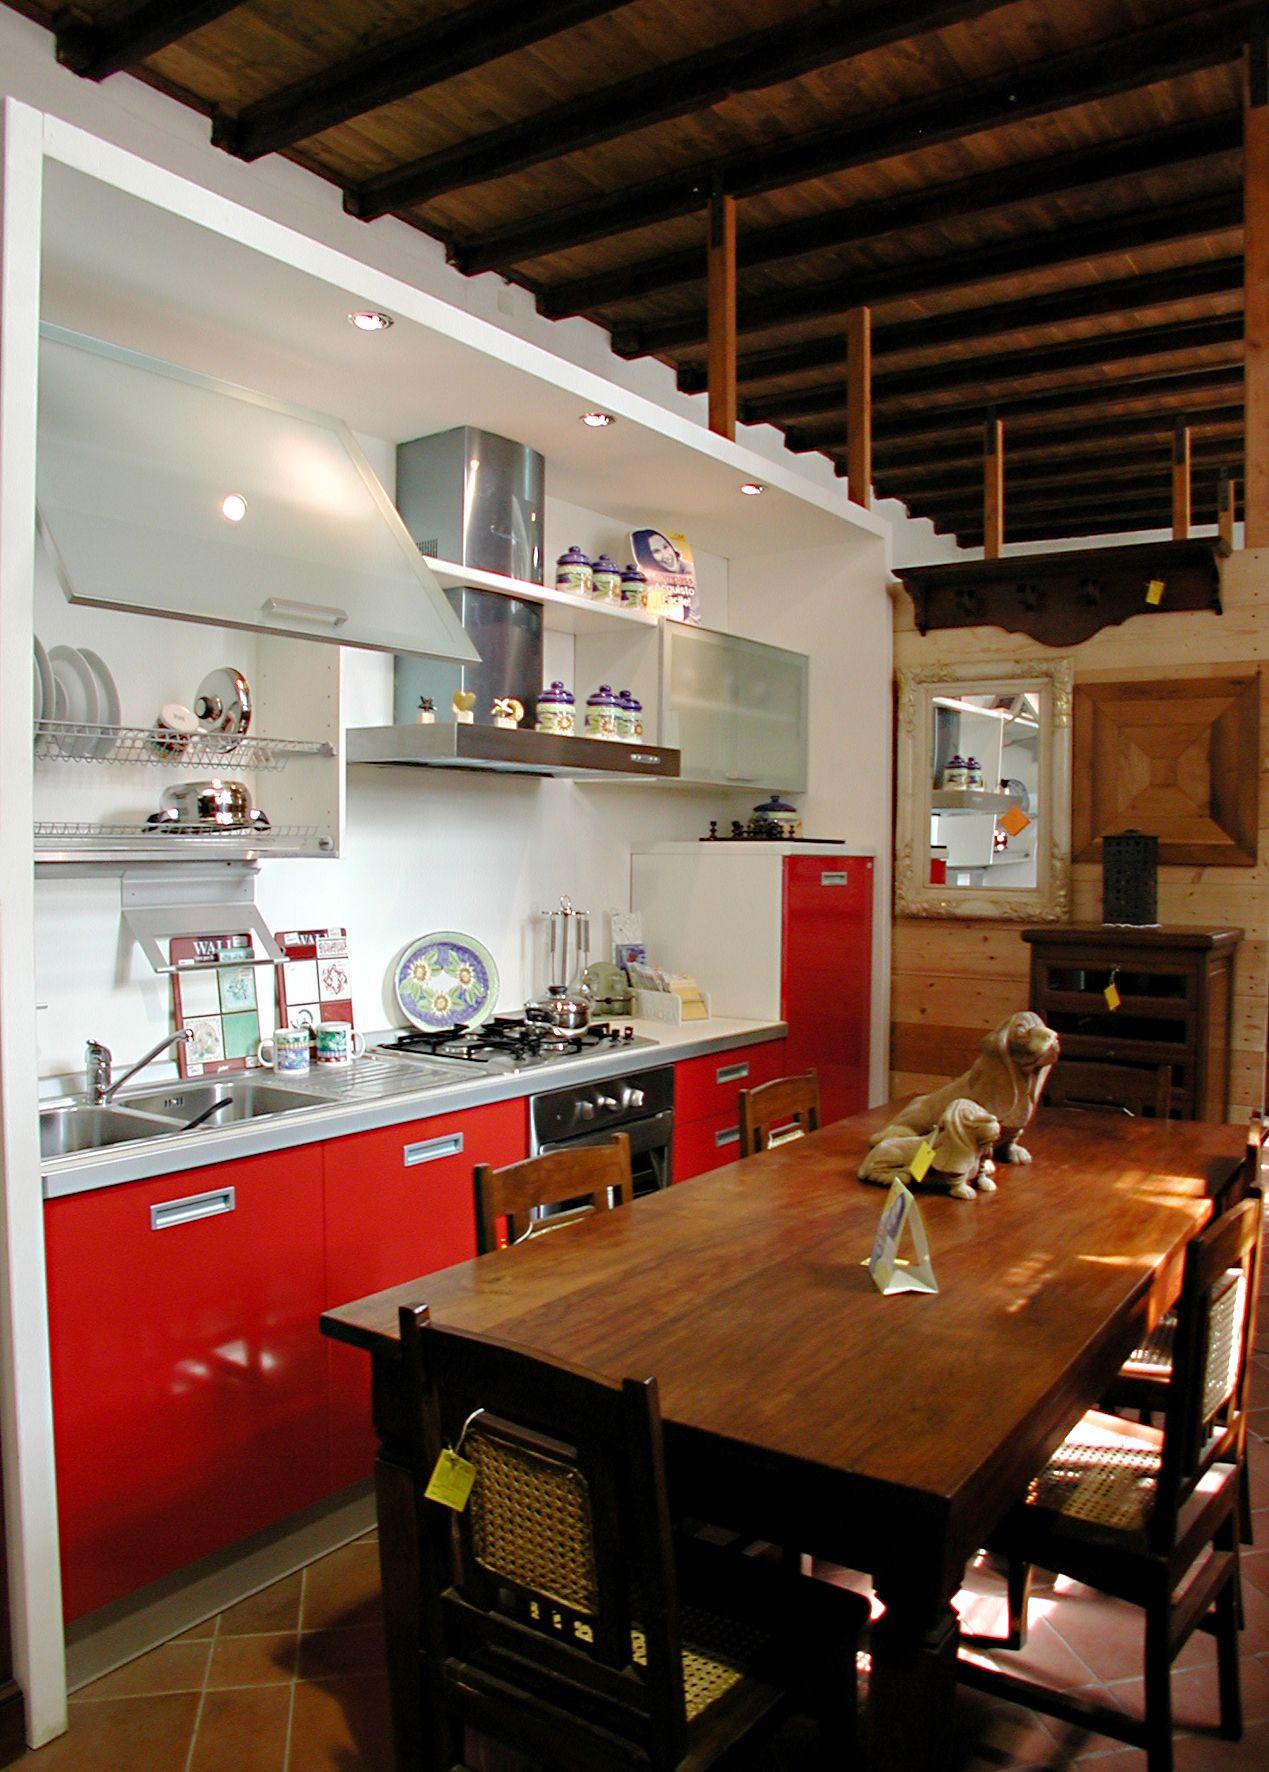 Emejing Cucina Rossa Scavolini Photos - Lepicentre.info ...